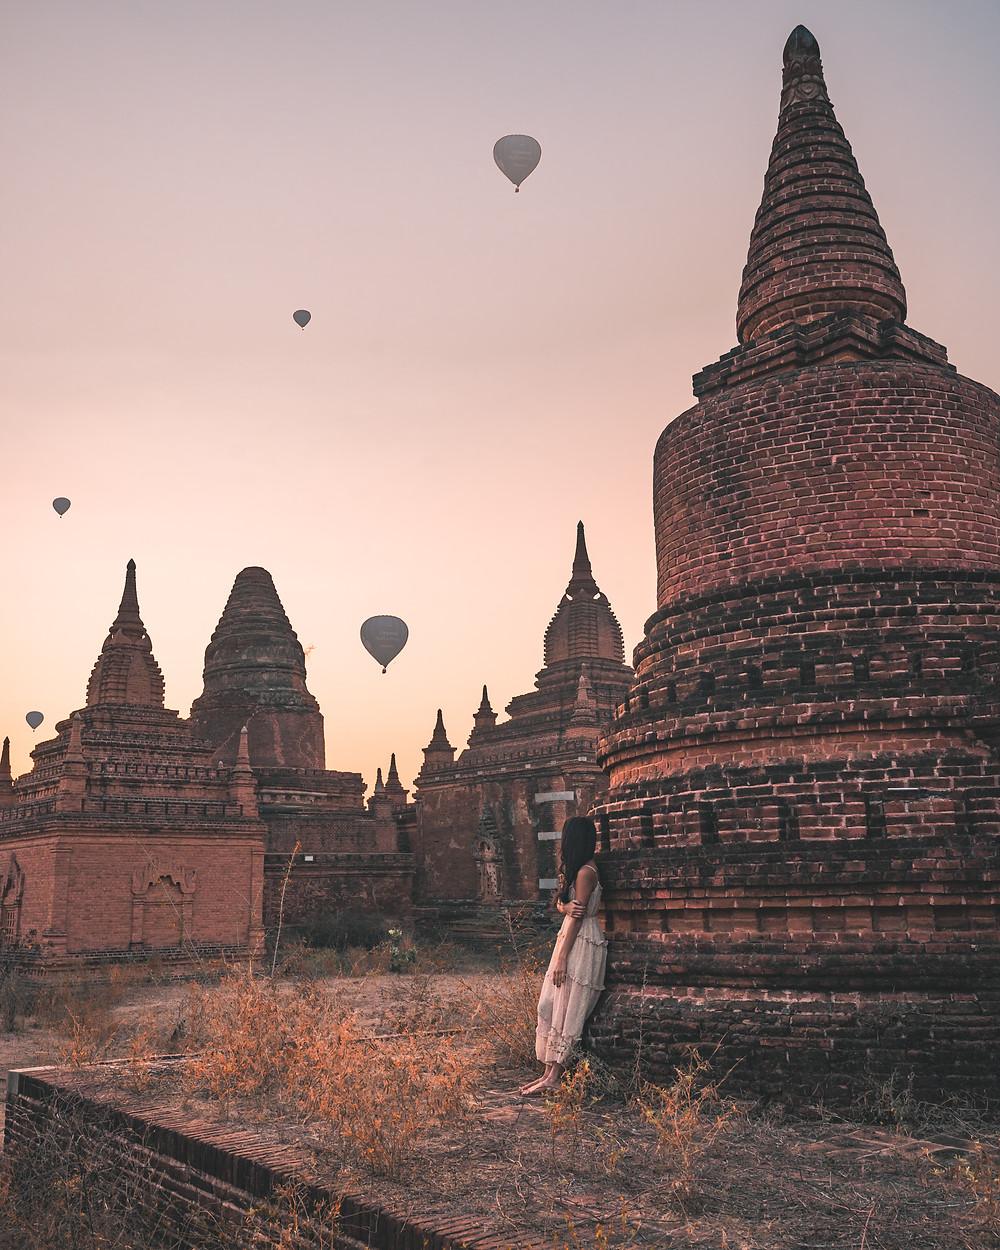 Shwe Nan Yin Taw Monastic Complex, Old Bagan, Myanmar